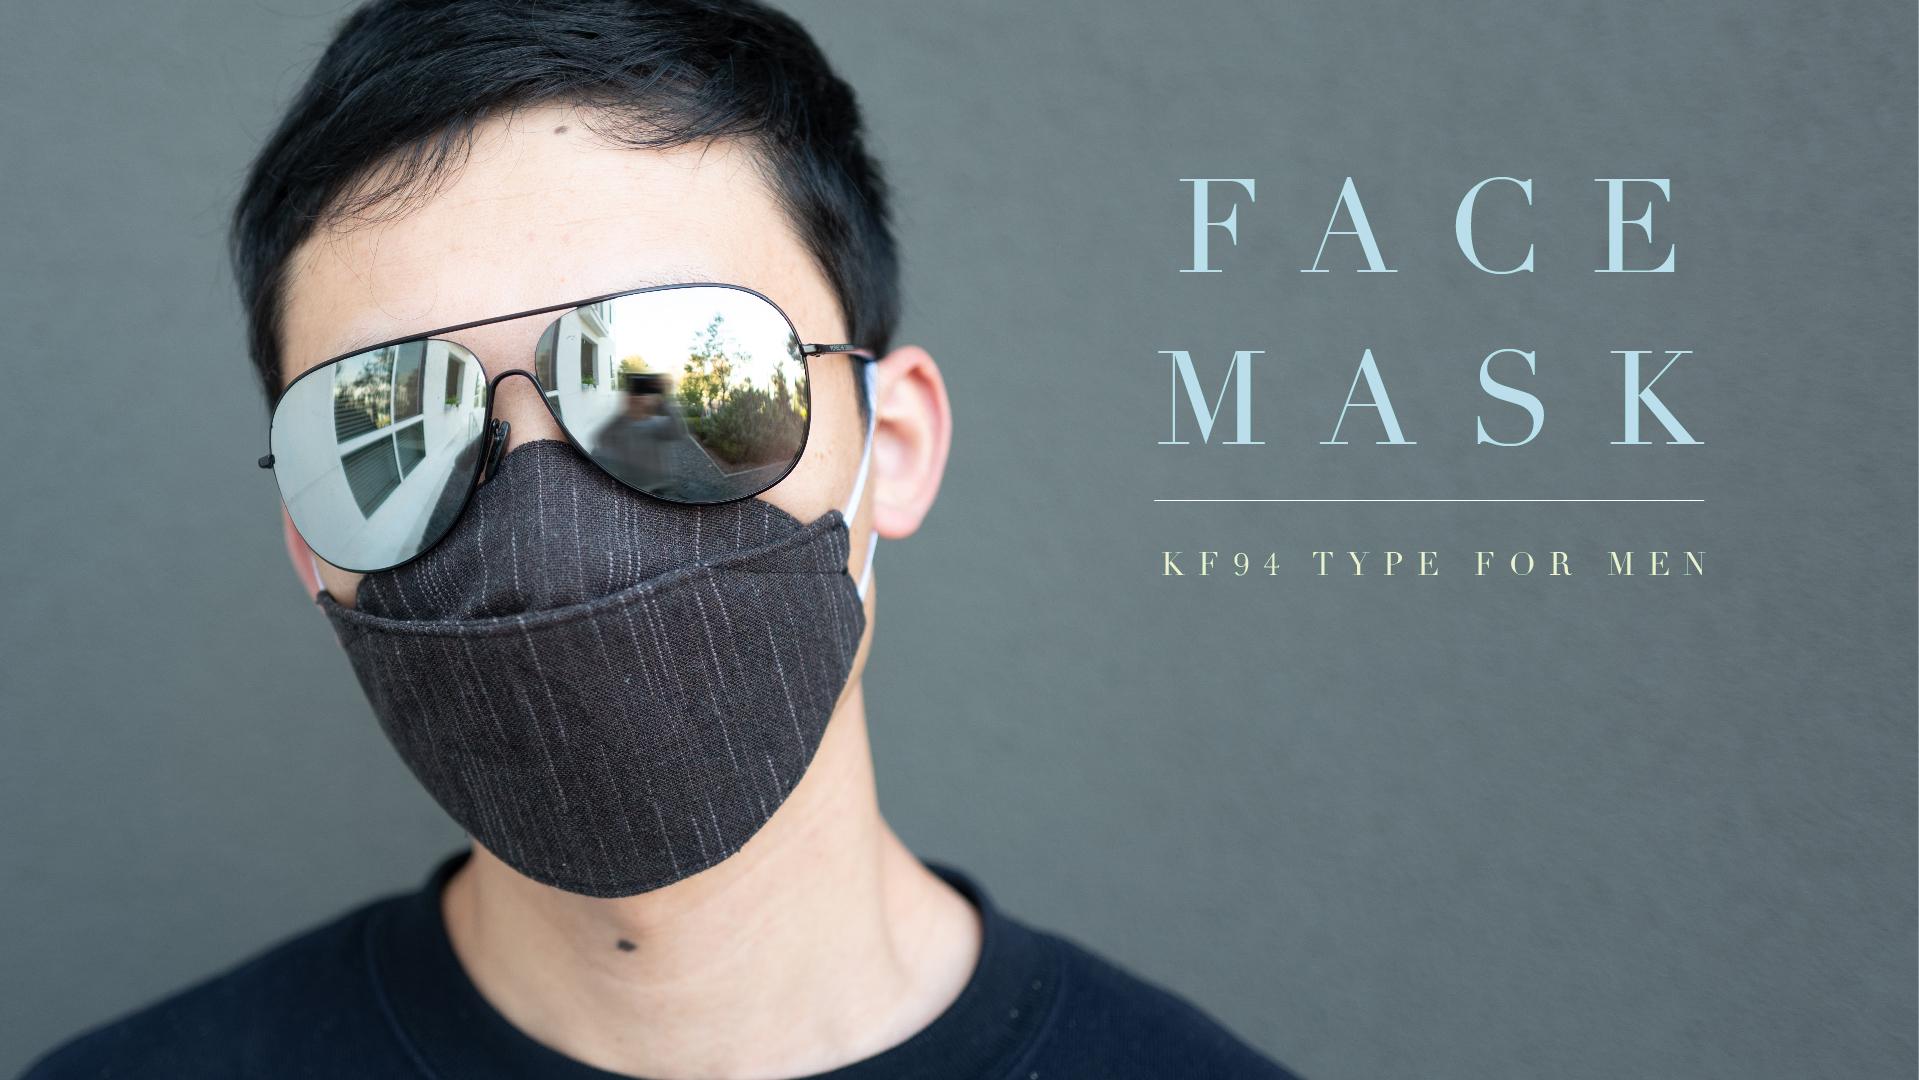 KF94 Face Mask V2